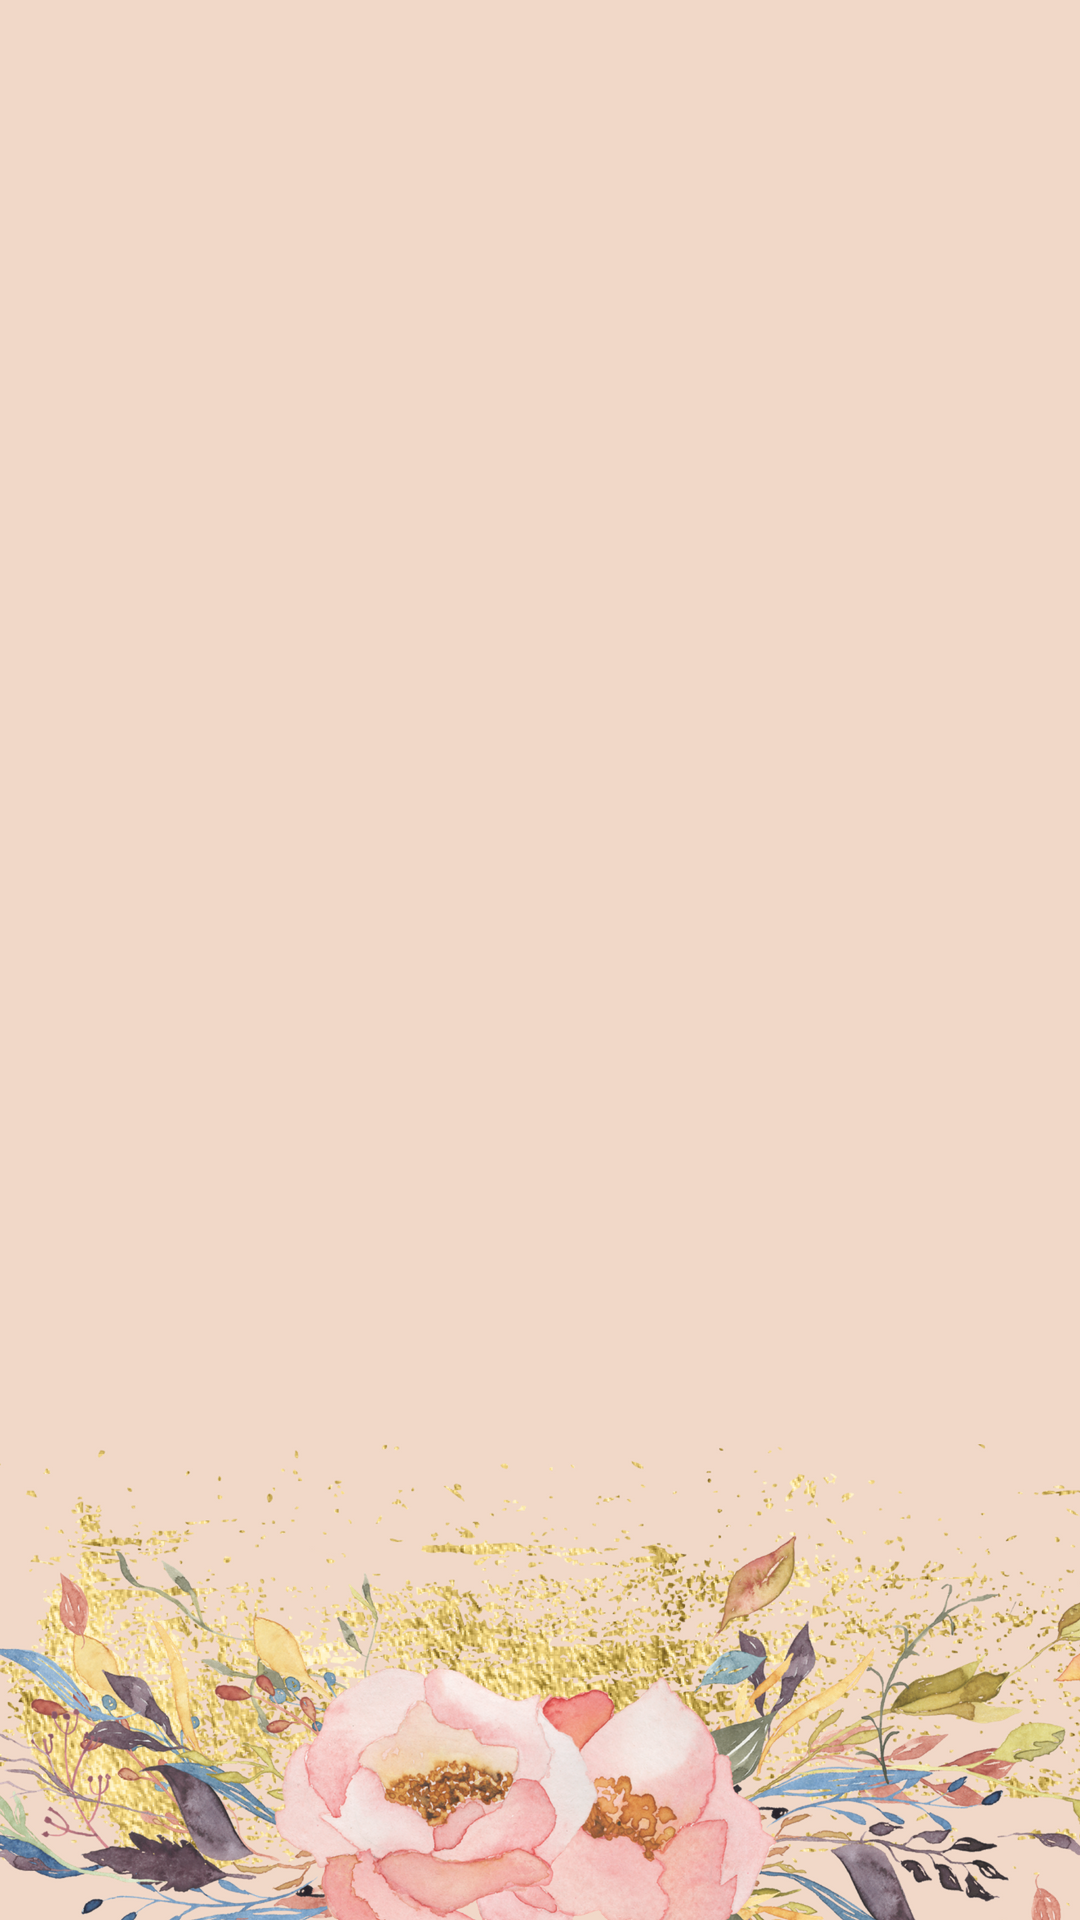 Pin By Kim Comine Santos On Sohranennye Piny Instagram Wallpaper Instagram Background Instagram Template